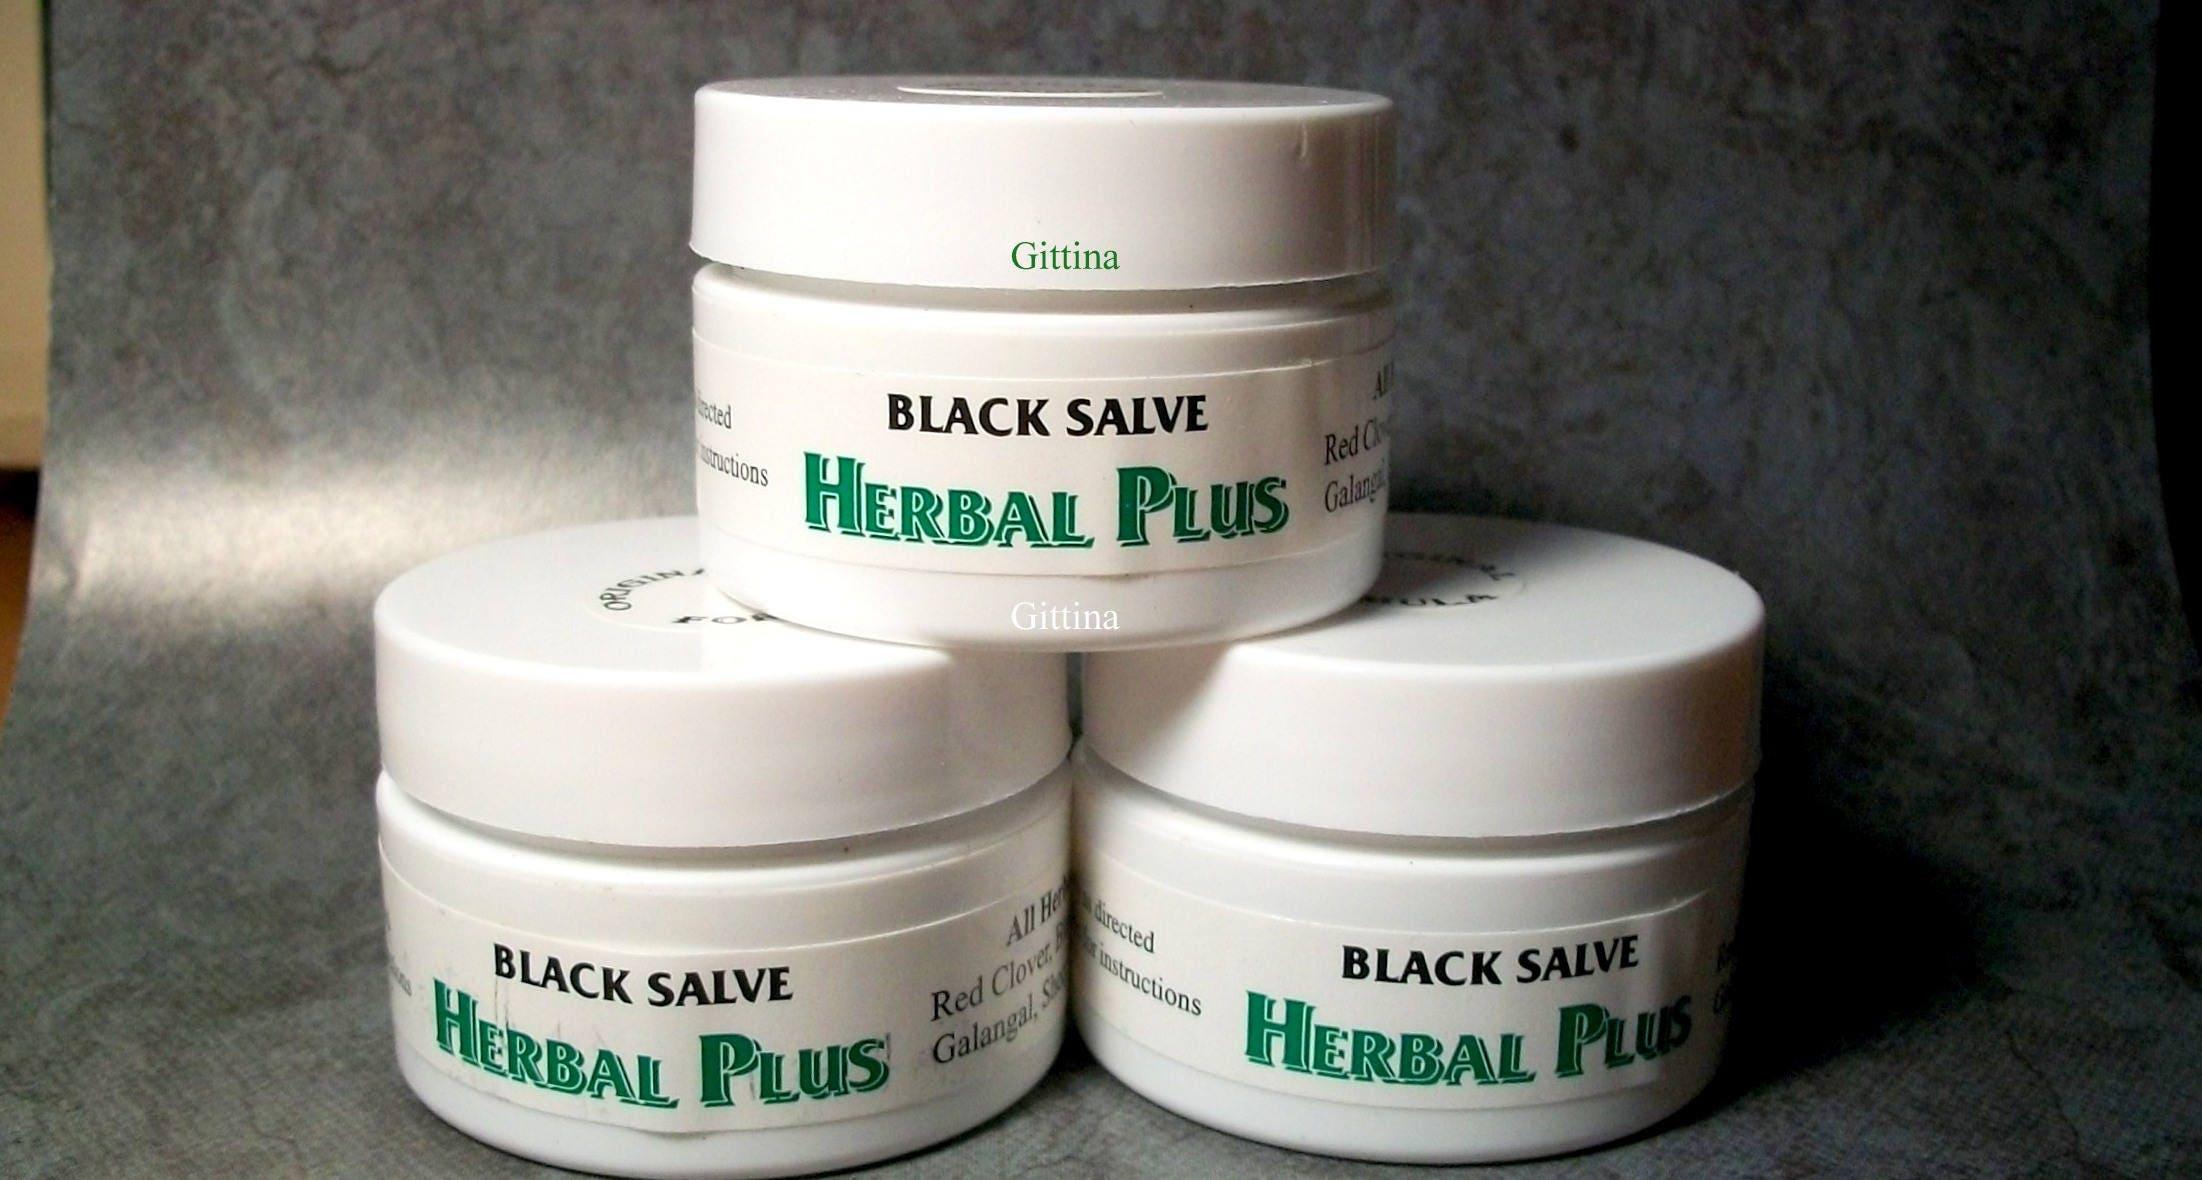 herbal plus black salve instructions